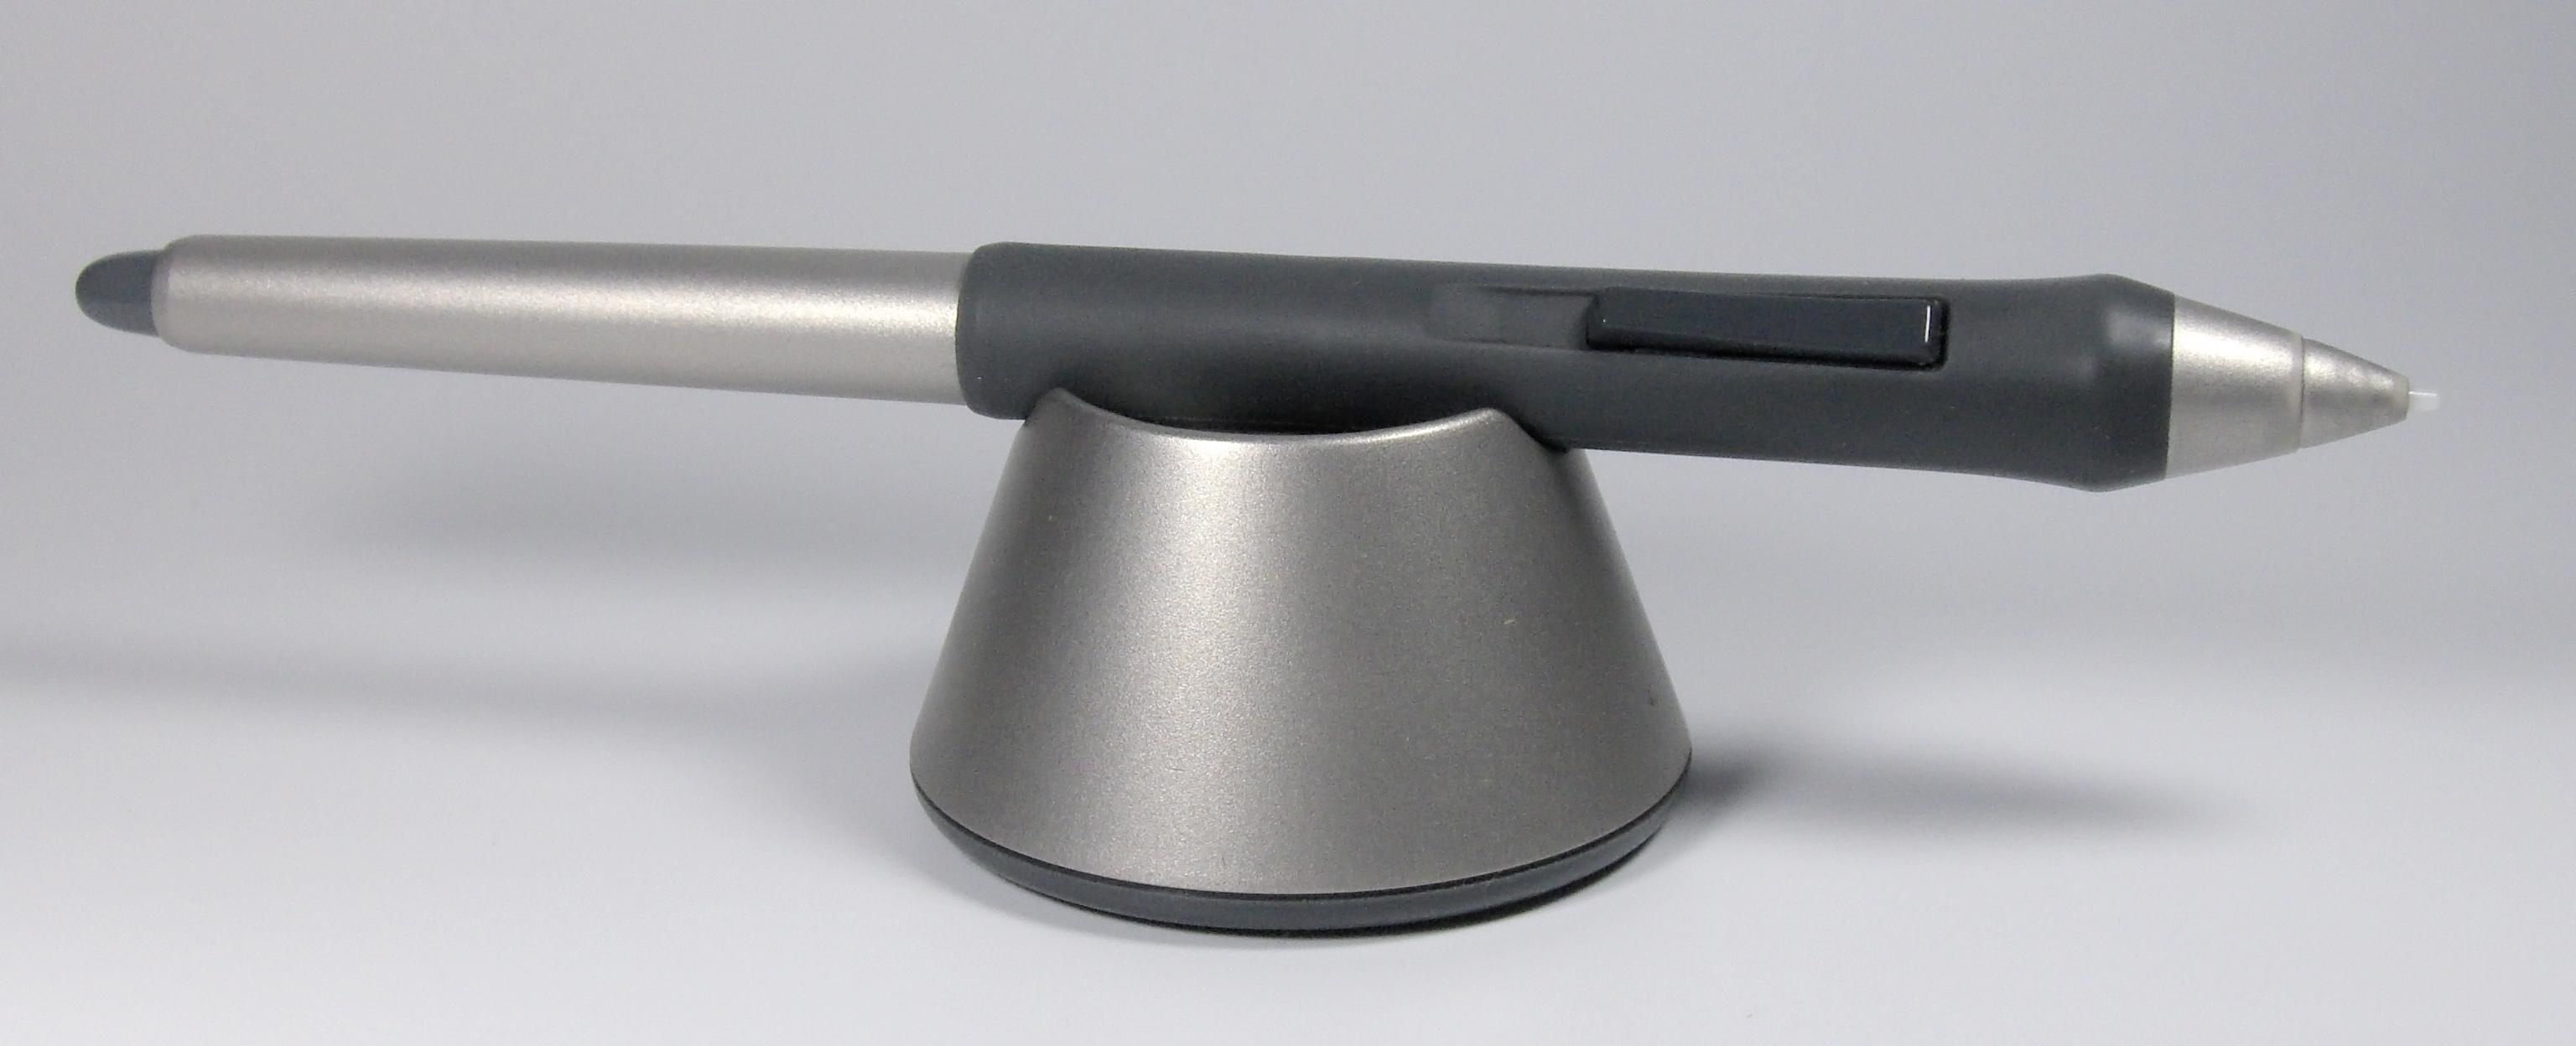 Description wacom pentable pen